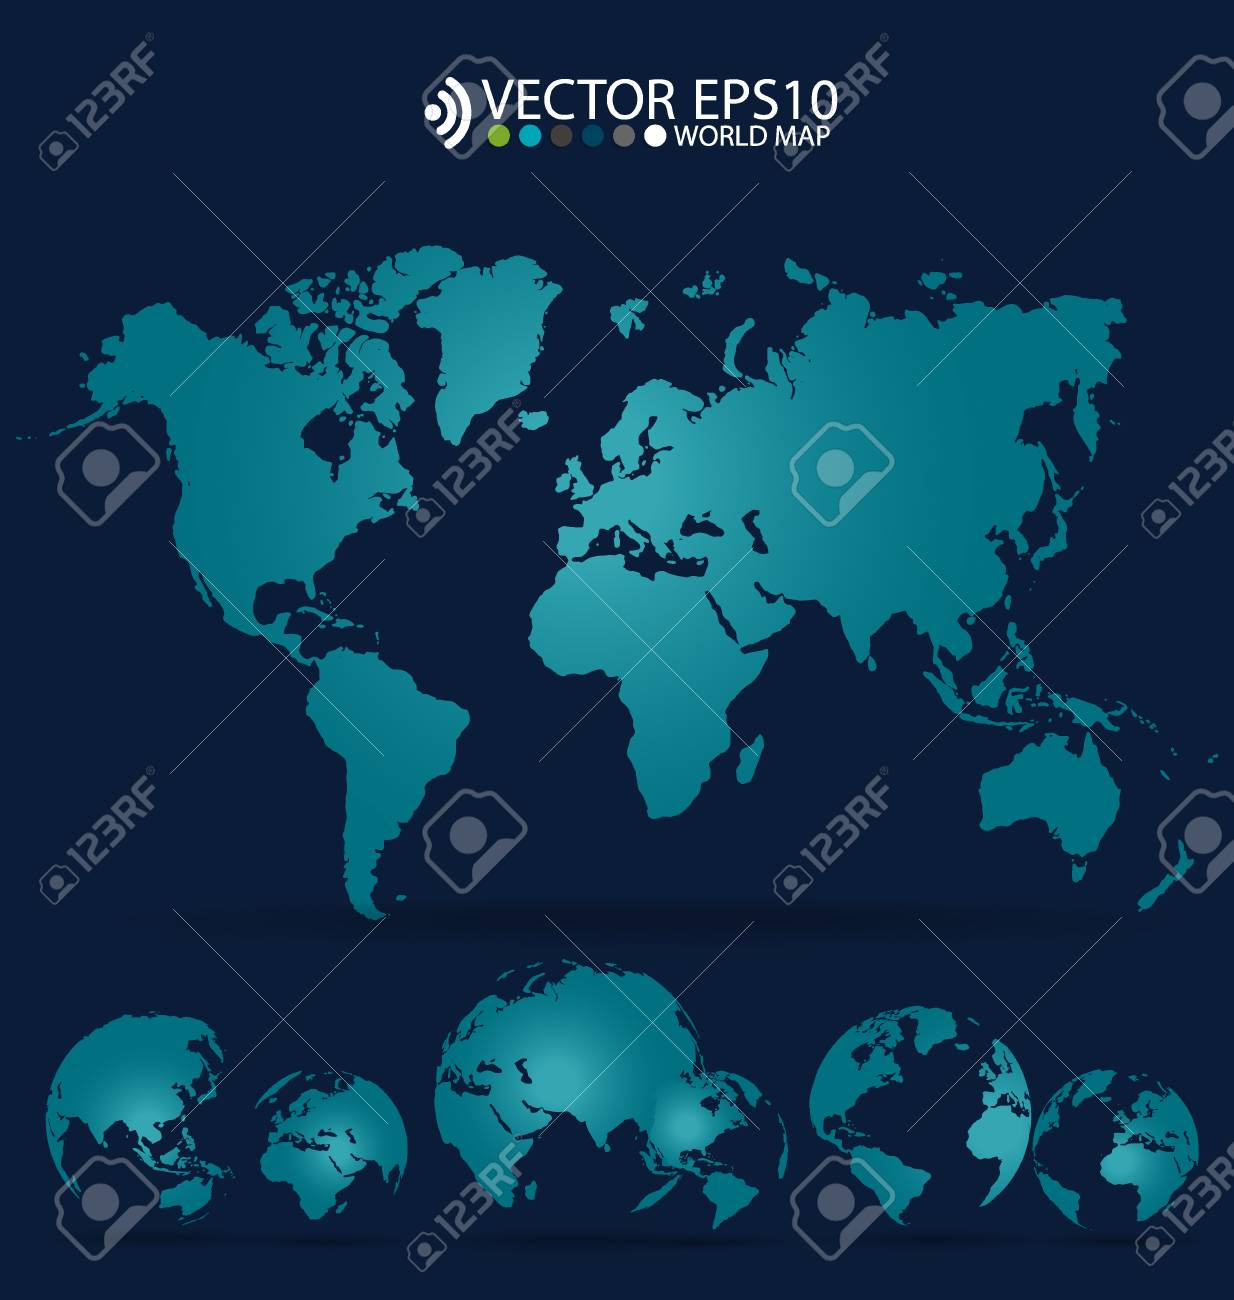 Modern world map design vector illustration royalty free cliparts modern world map design vector illustration stock vector 31873289 gumiabroncs Images